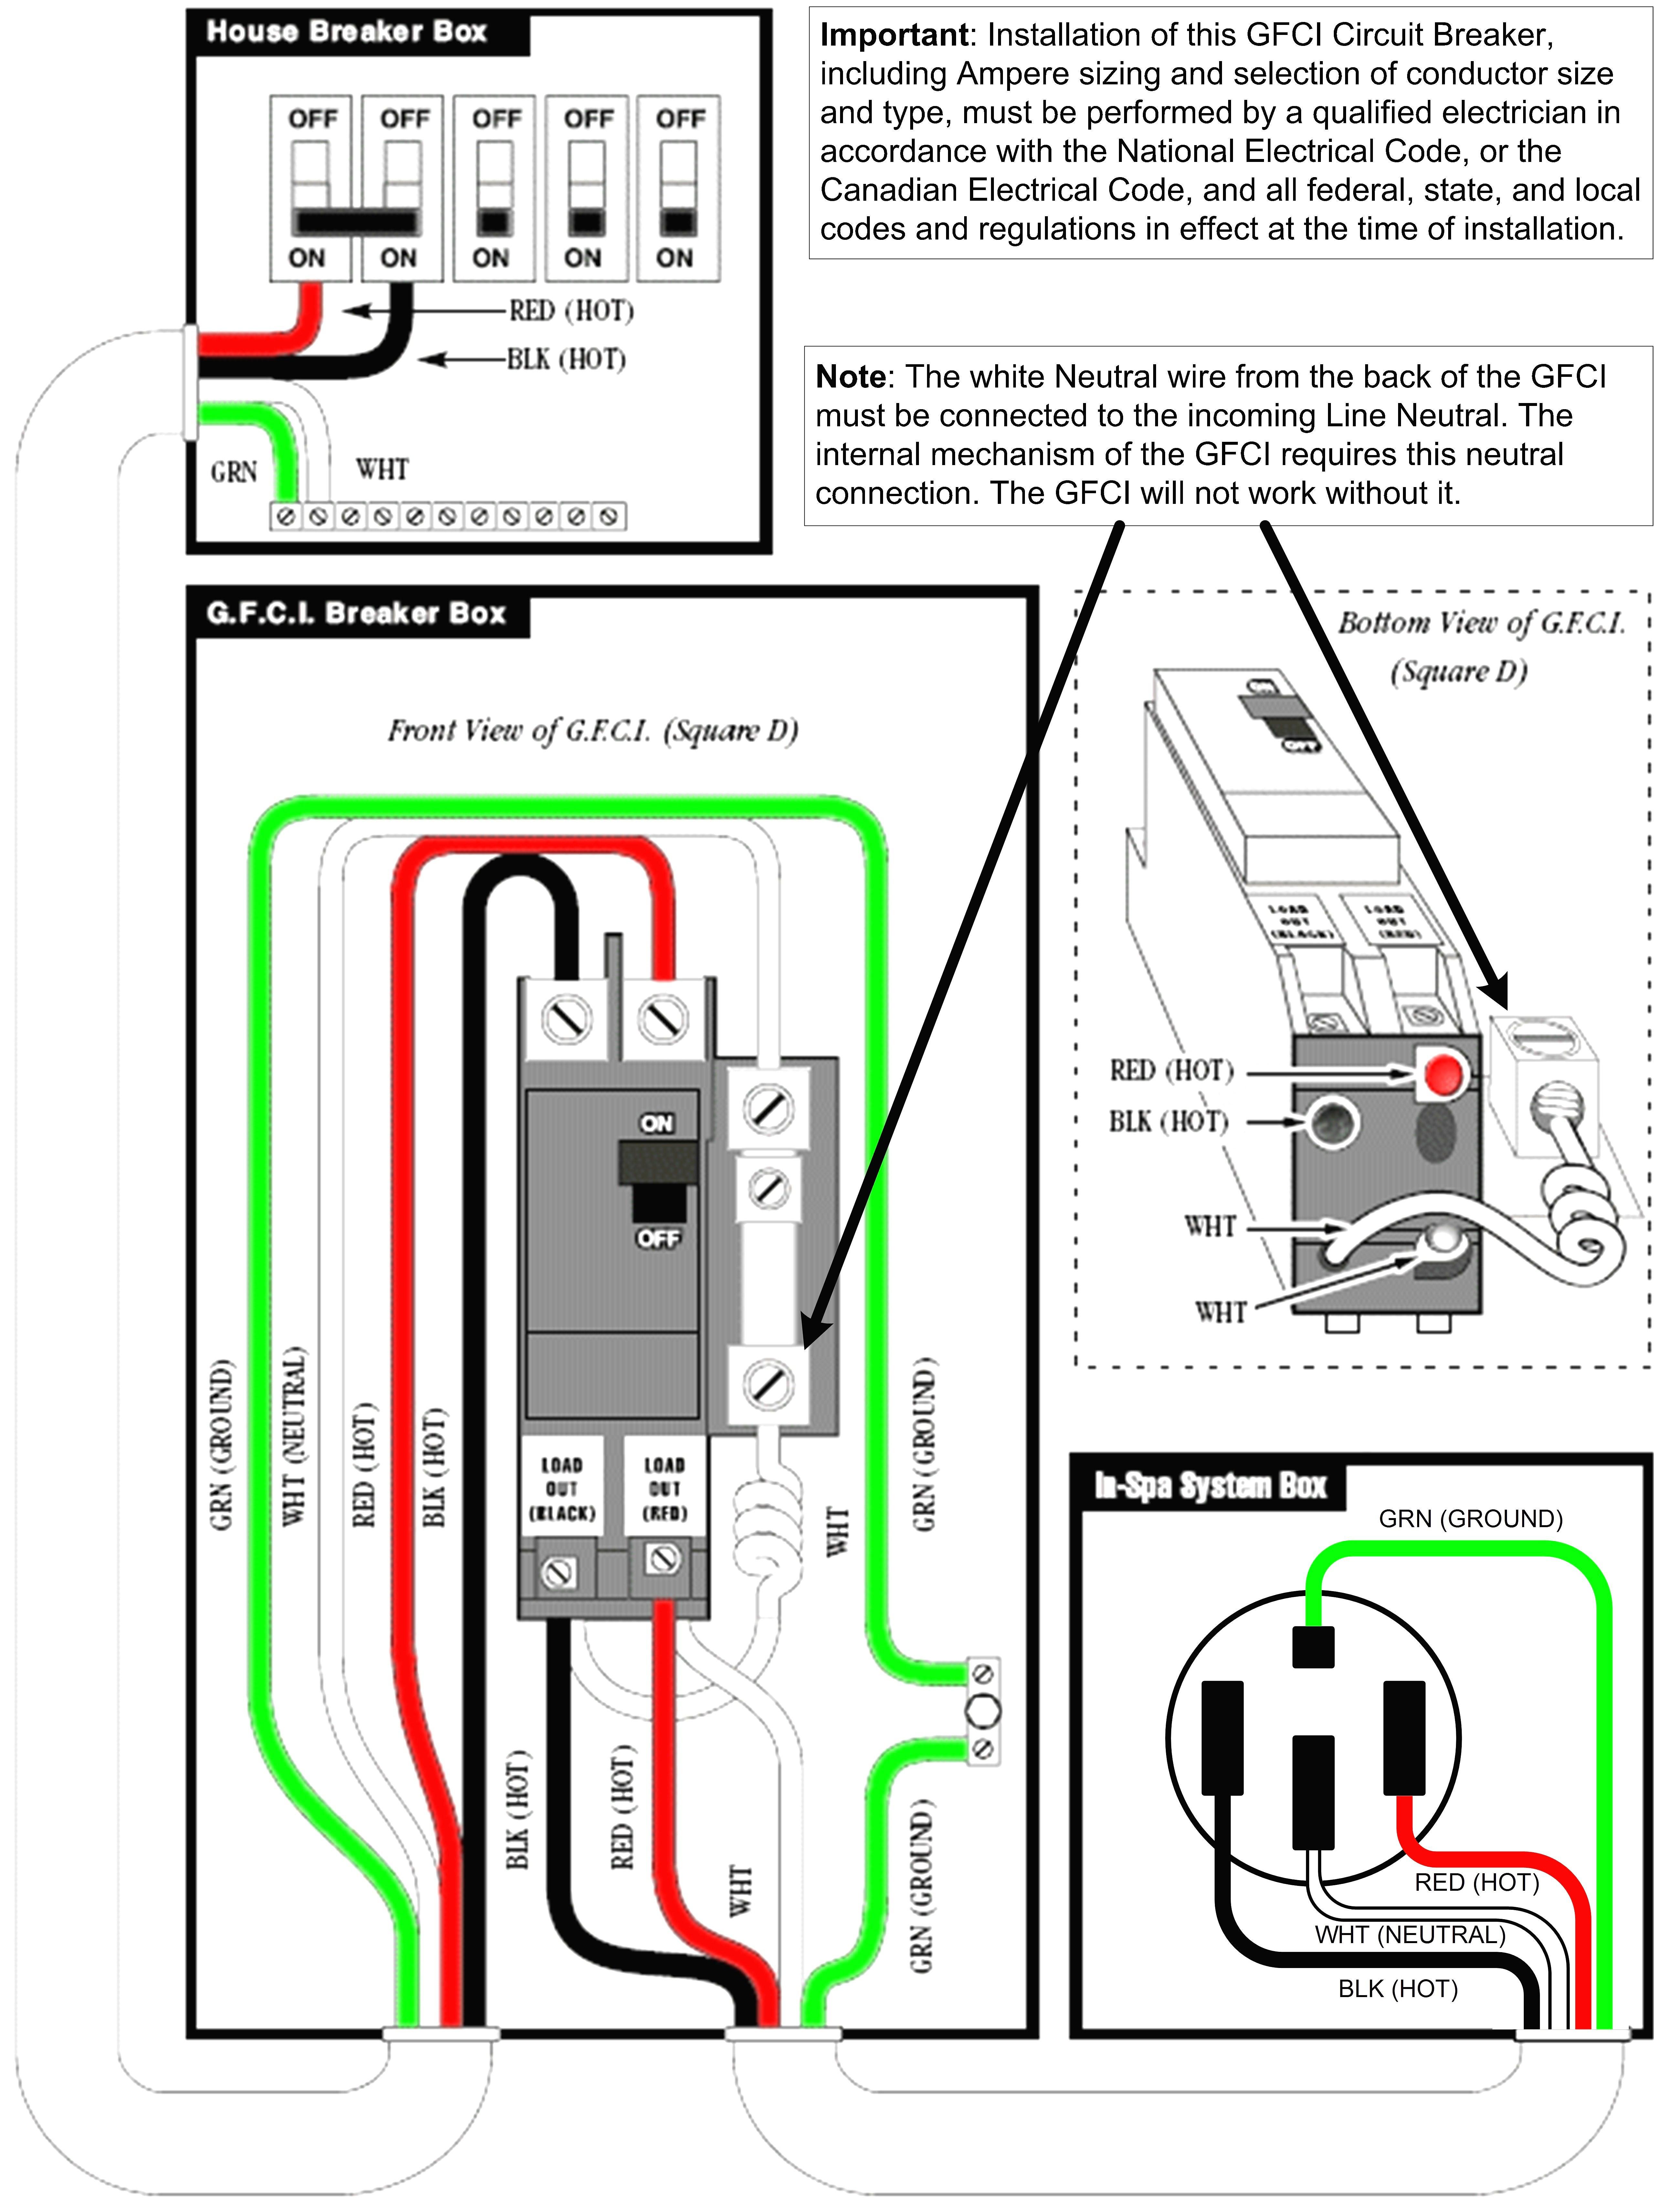 220 Electrical Wiring Diagrams - Today Wiring Diagram - 220 To 110 Wiring Diagram